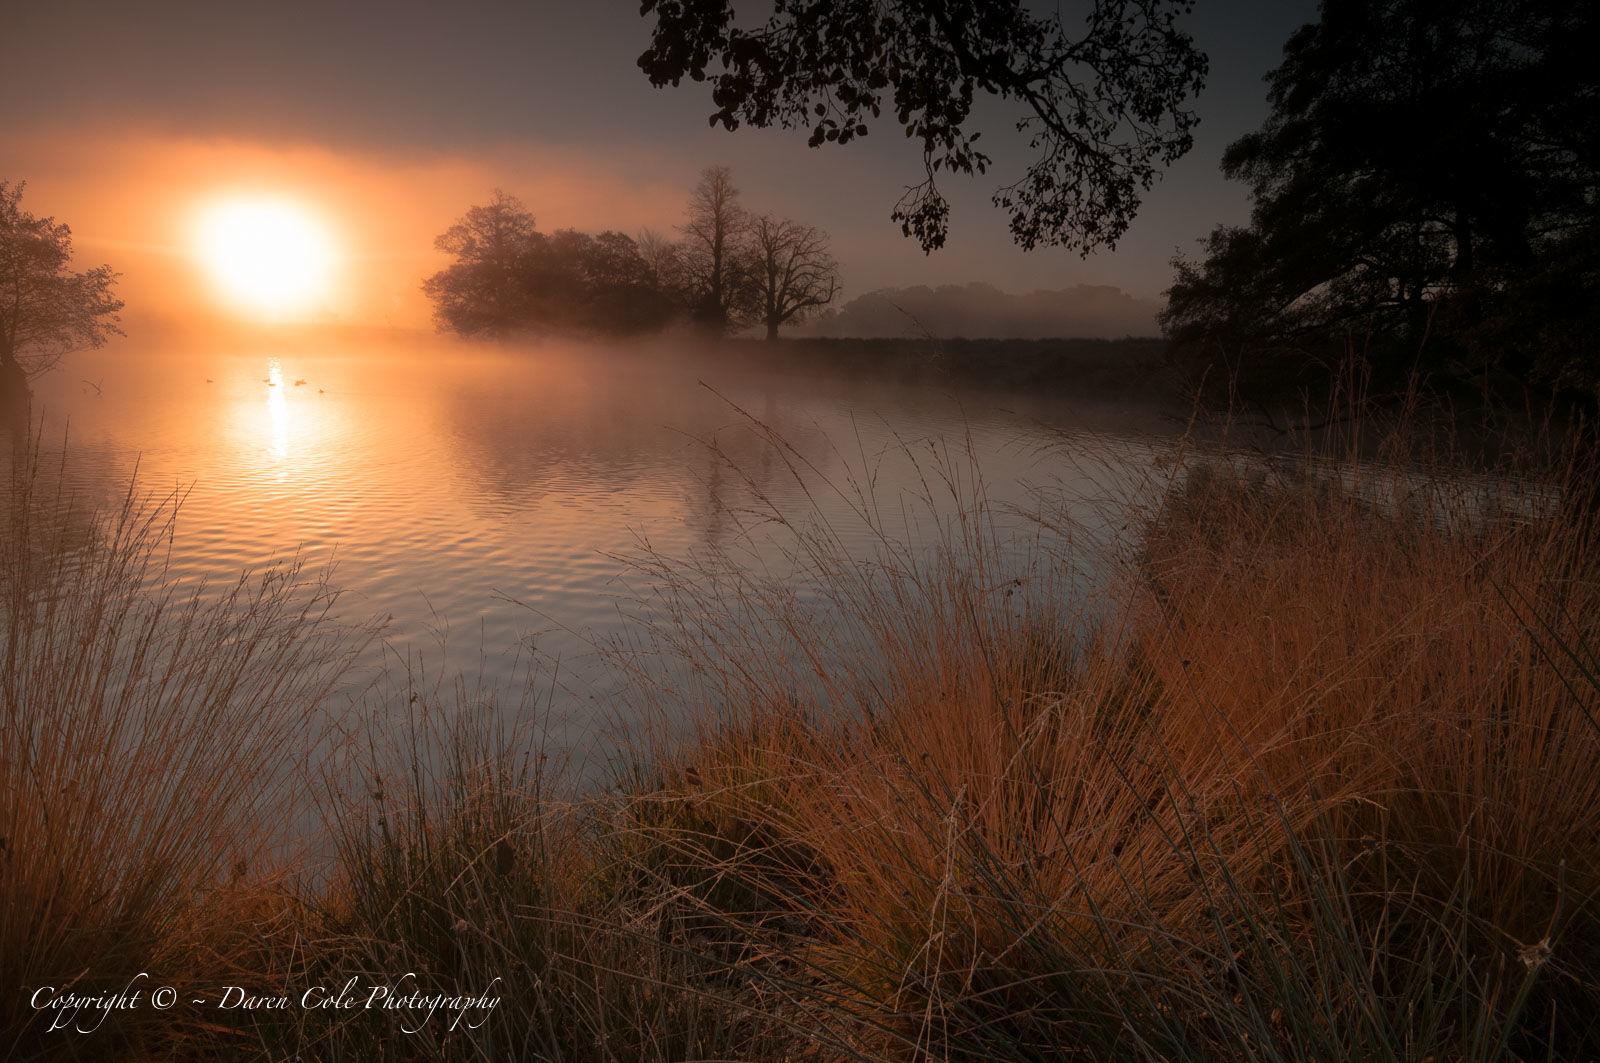 Early Morning Pond Mist Sunrise